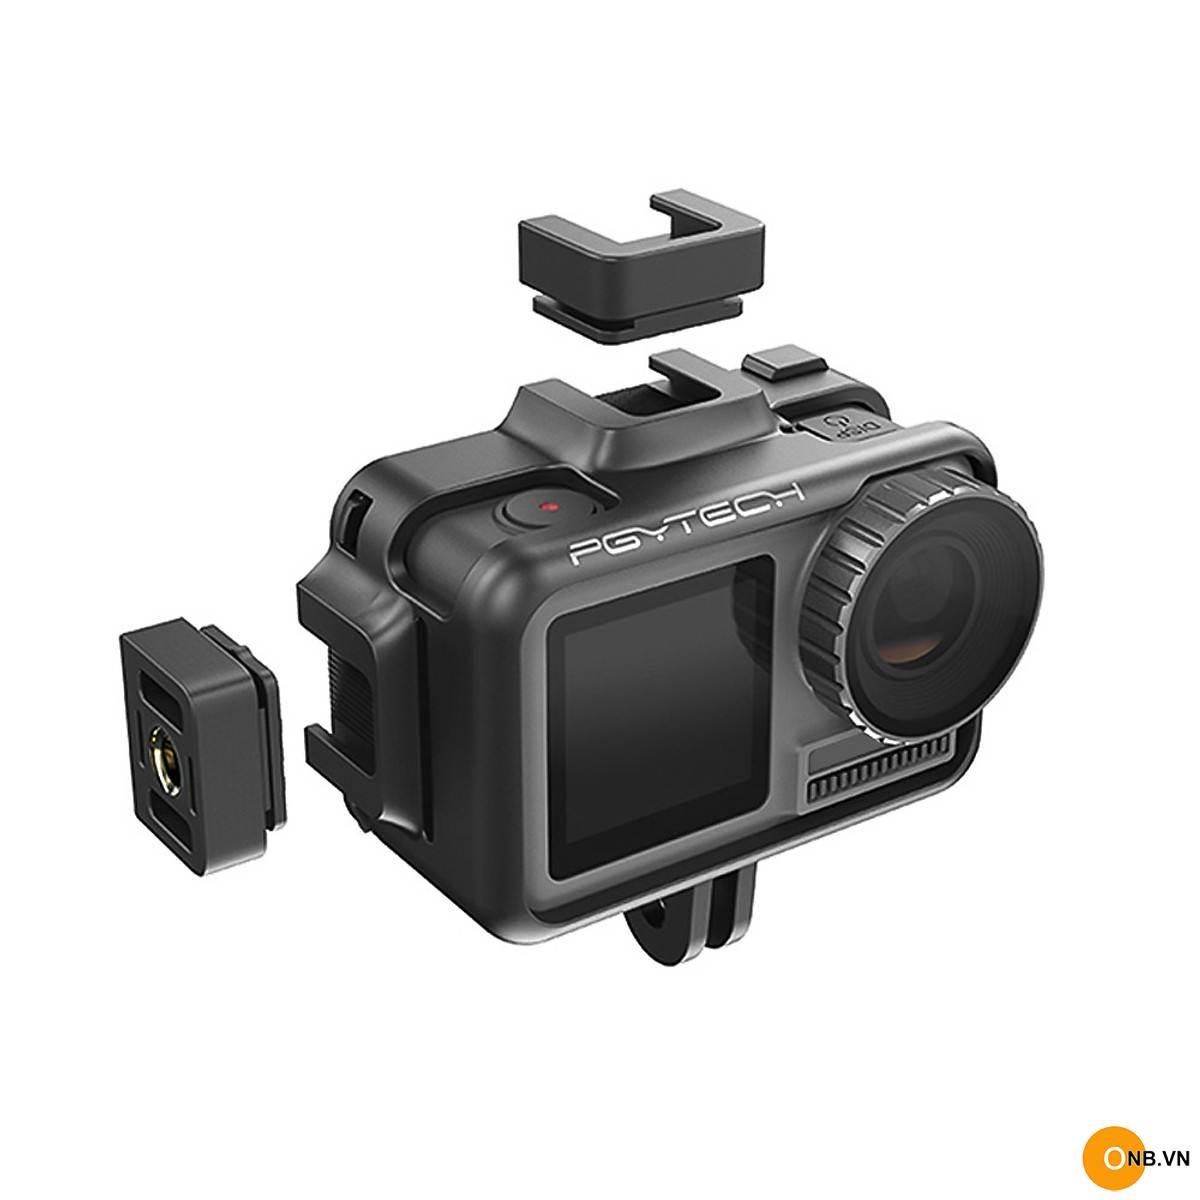 PGYTECH Cage DJI OSMO Action Camera - Khung bảo vệ